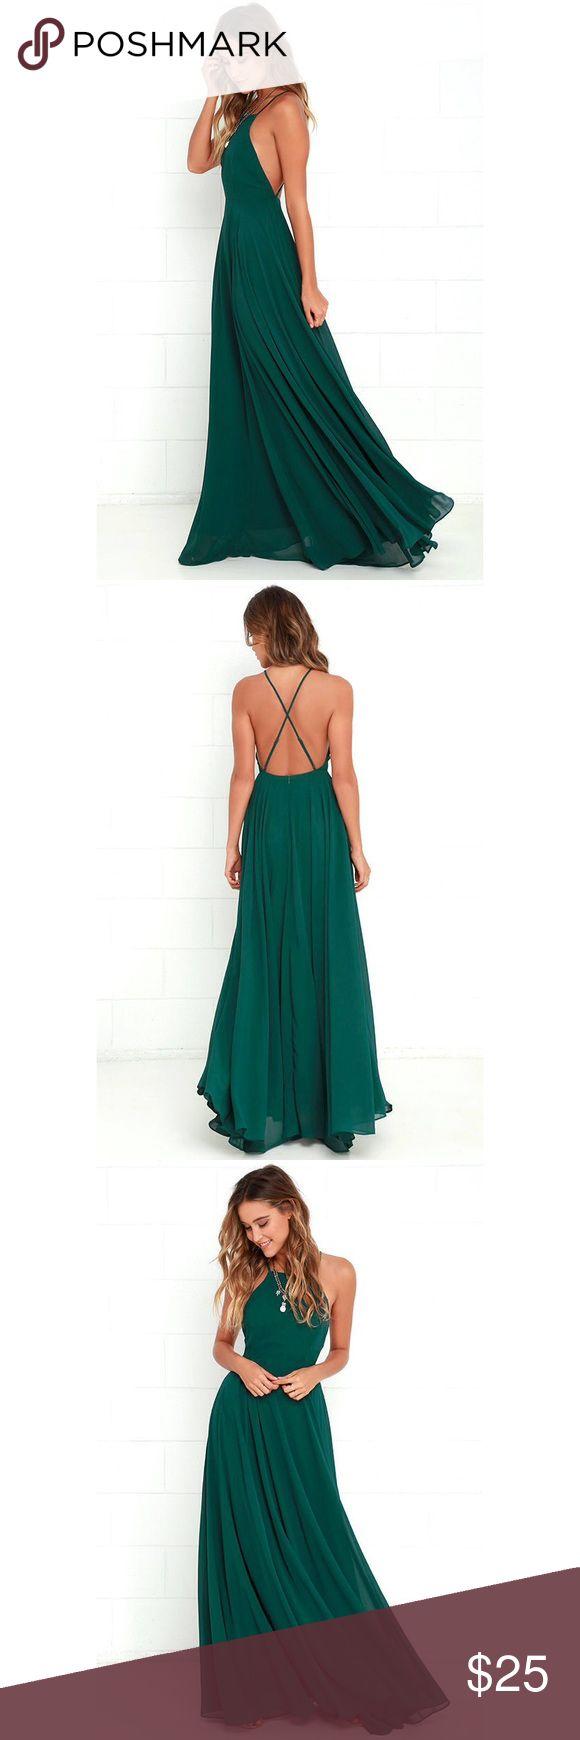 LuLus maxi dress Green maxi dress, never before worn Lulu's Dresses Maxi